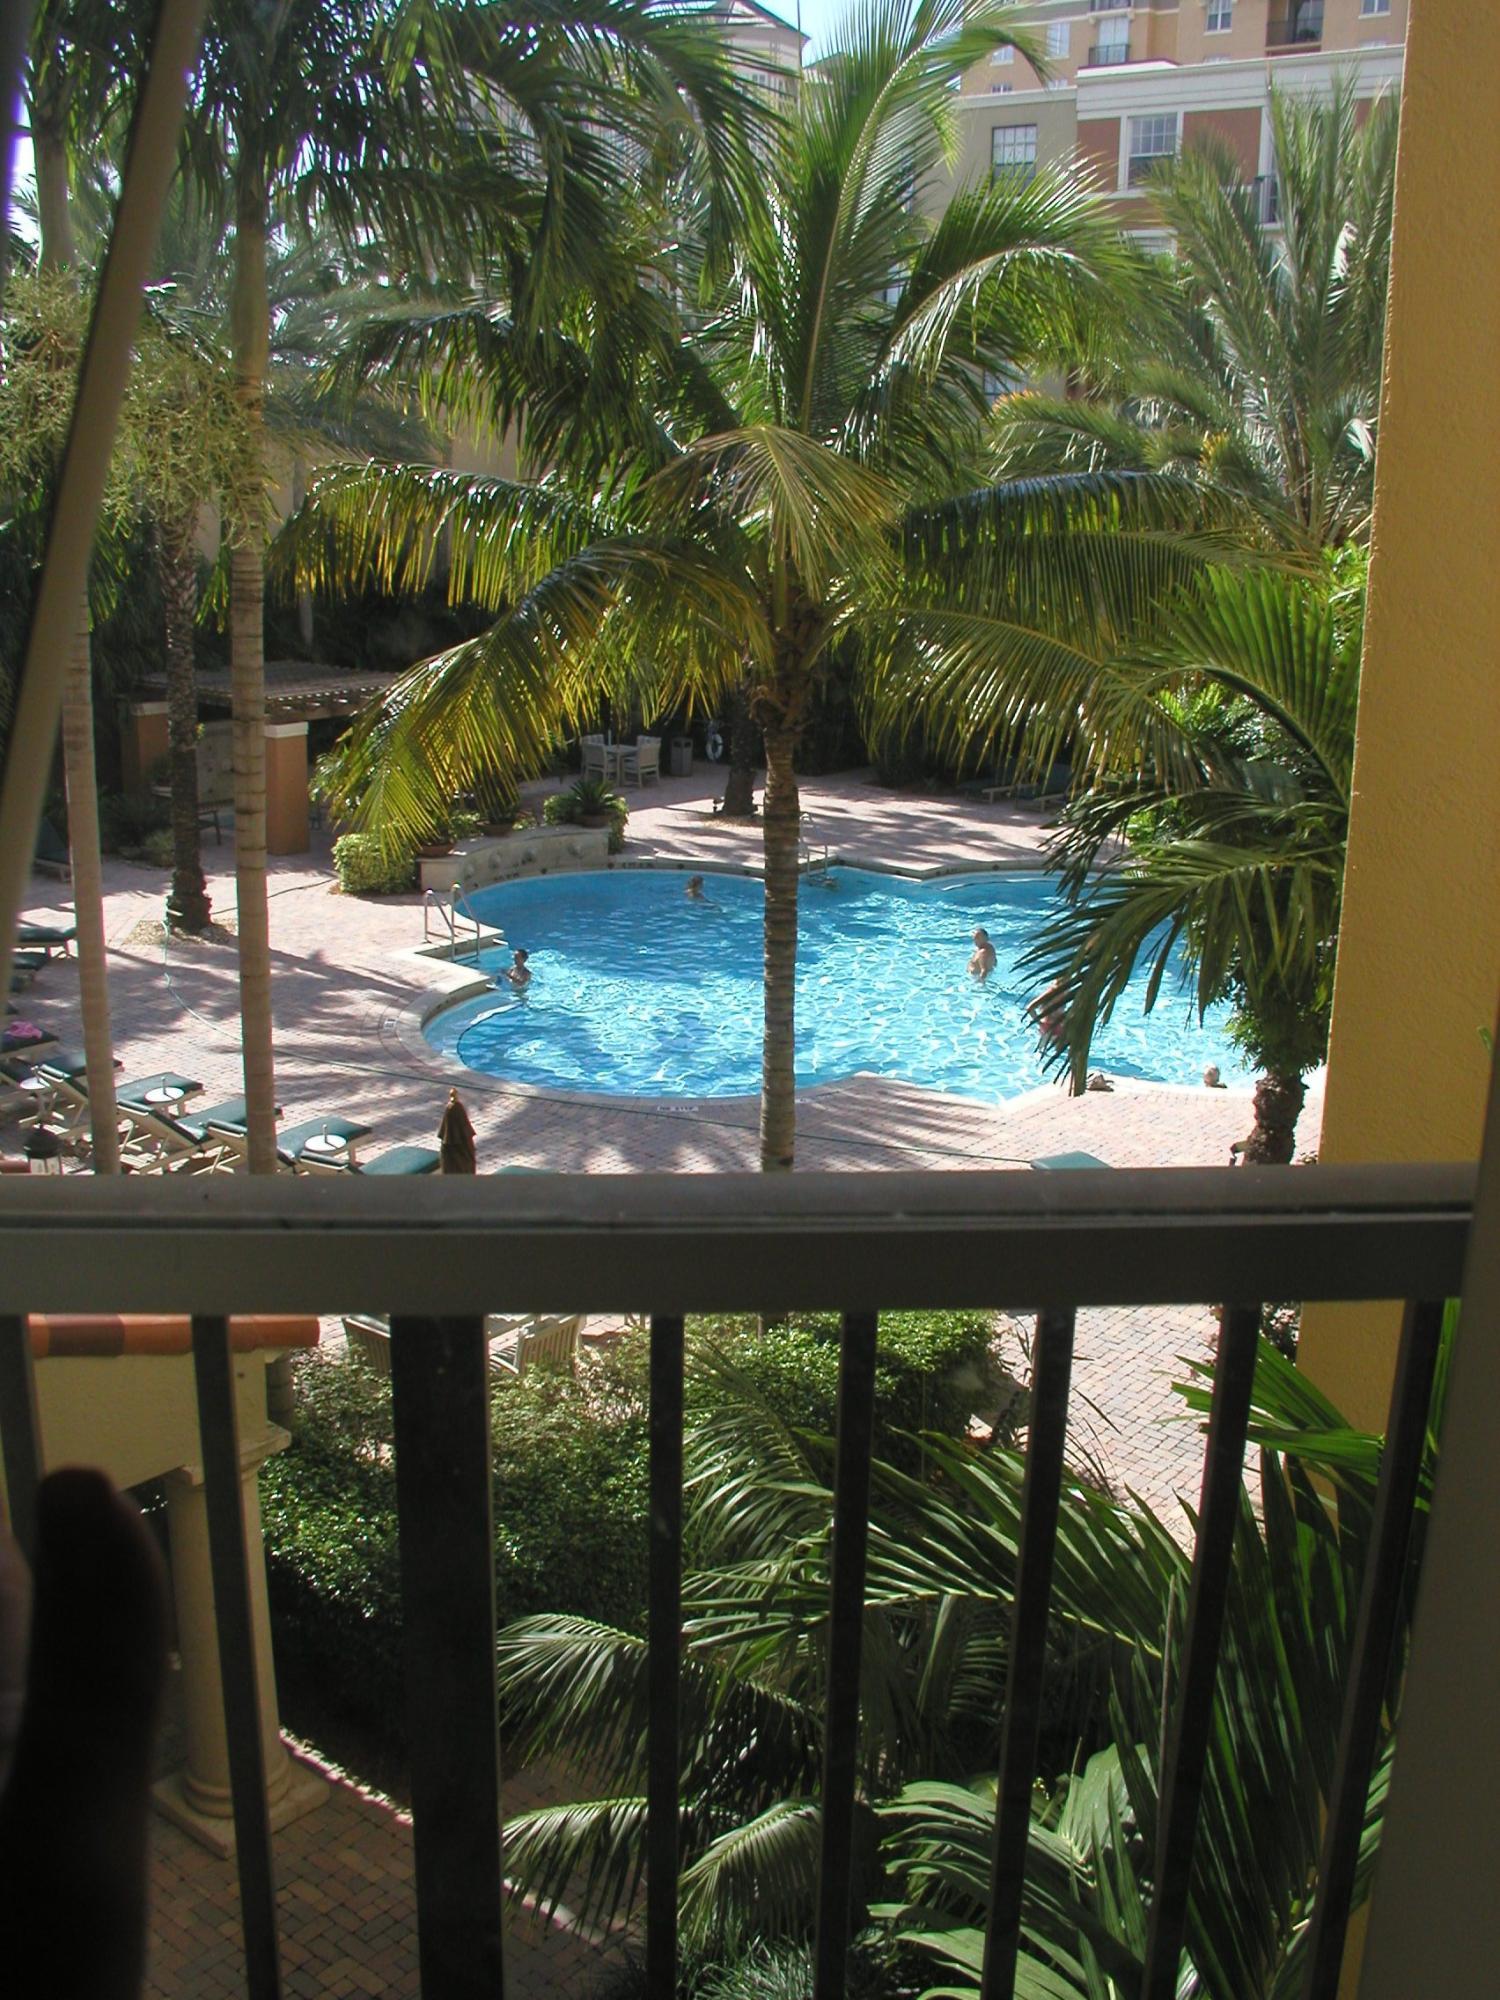 780 Sapodilla Avenue, West Palm Beach, Florida 33401, 2 Bedrooms Bedrooms, ,2 BathroomsBathrooms,Condo/Coop,For Rent,Courtyards in CityPlace,Sapodilla,5,RX-10418995